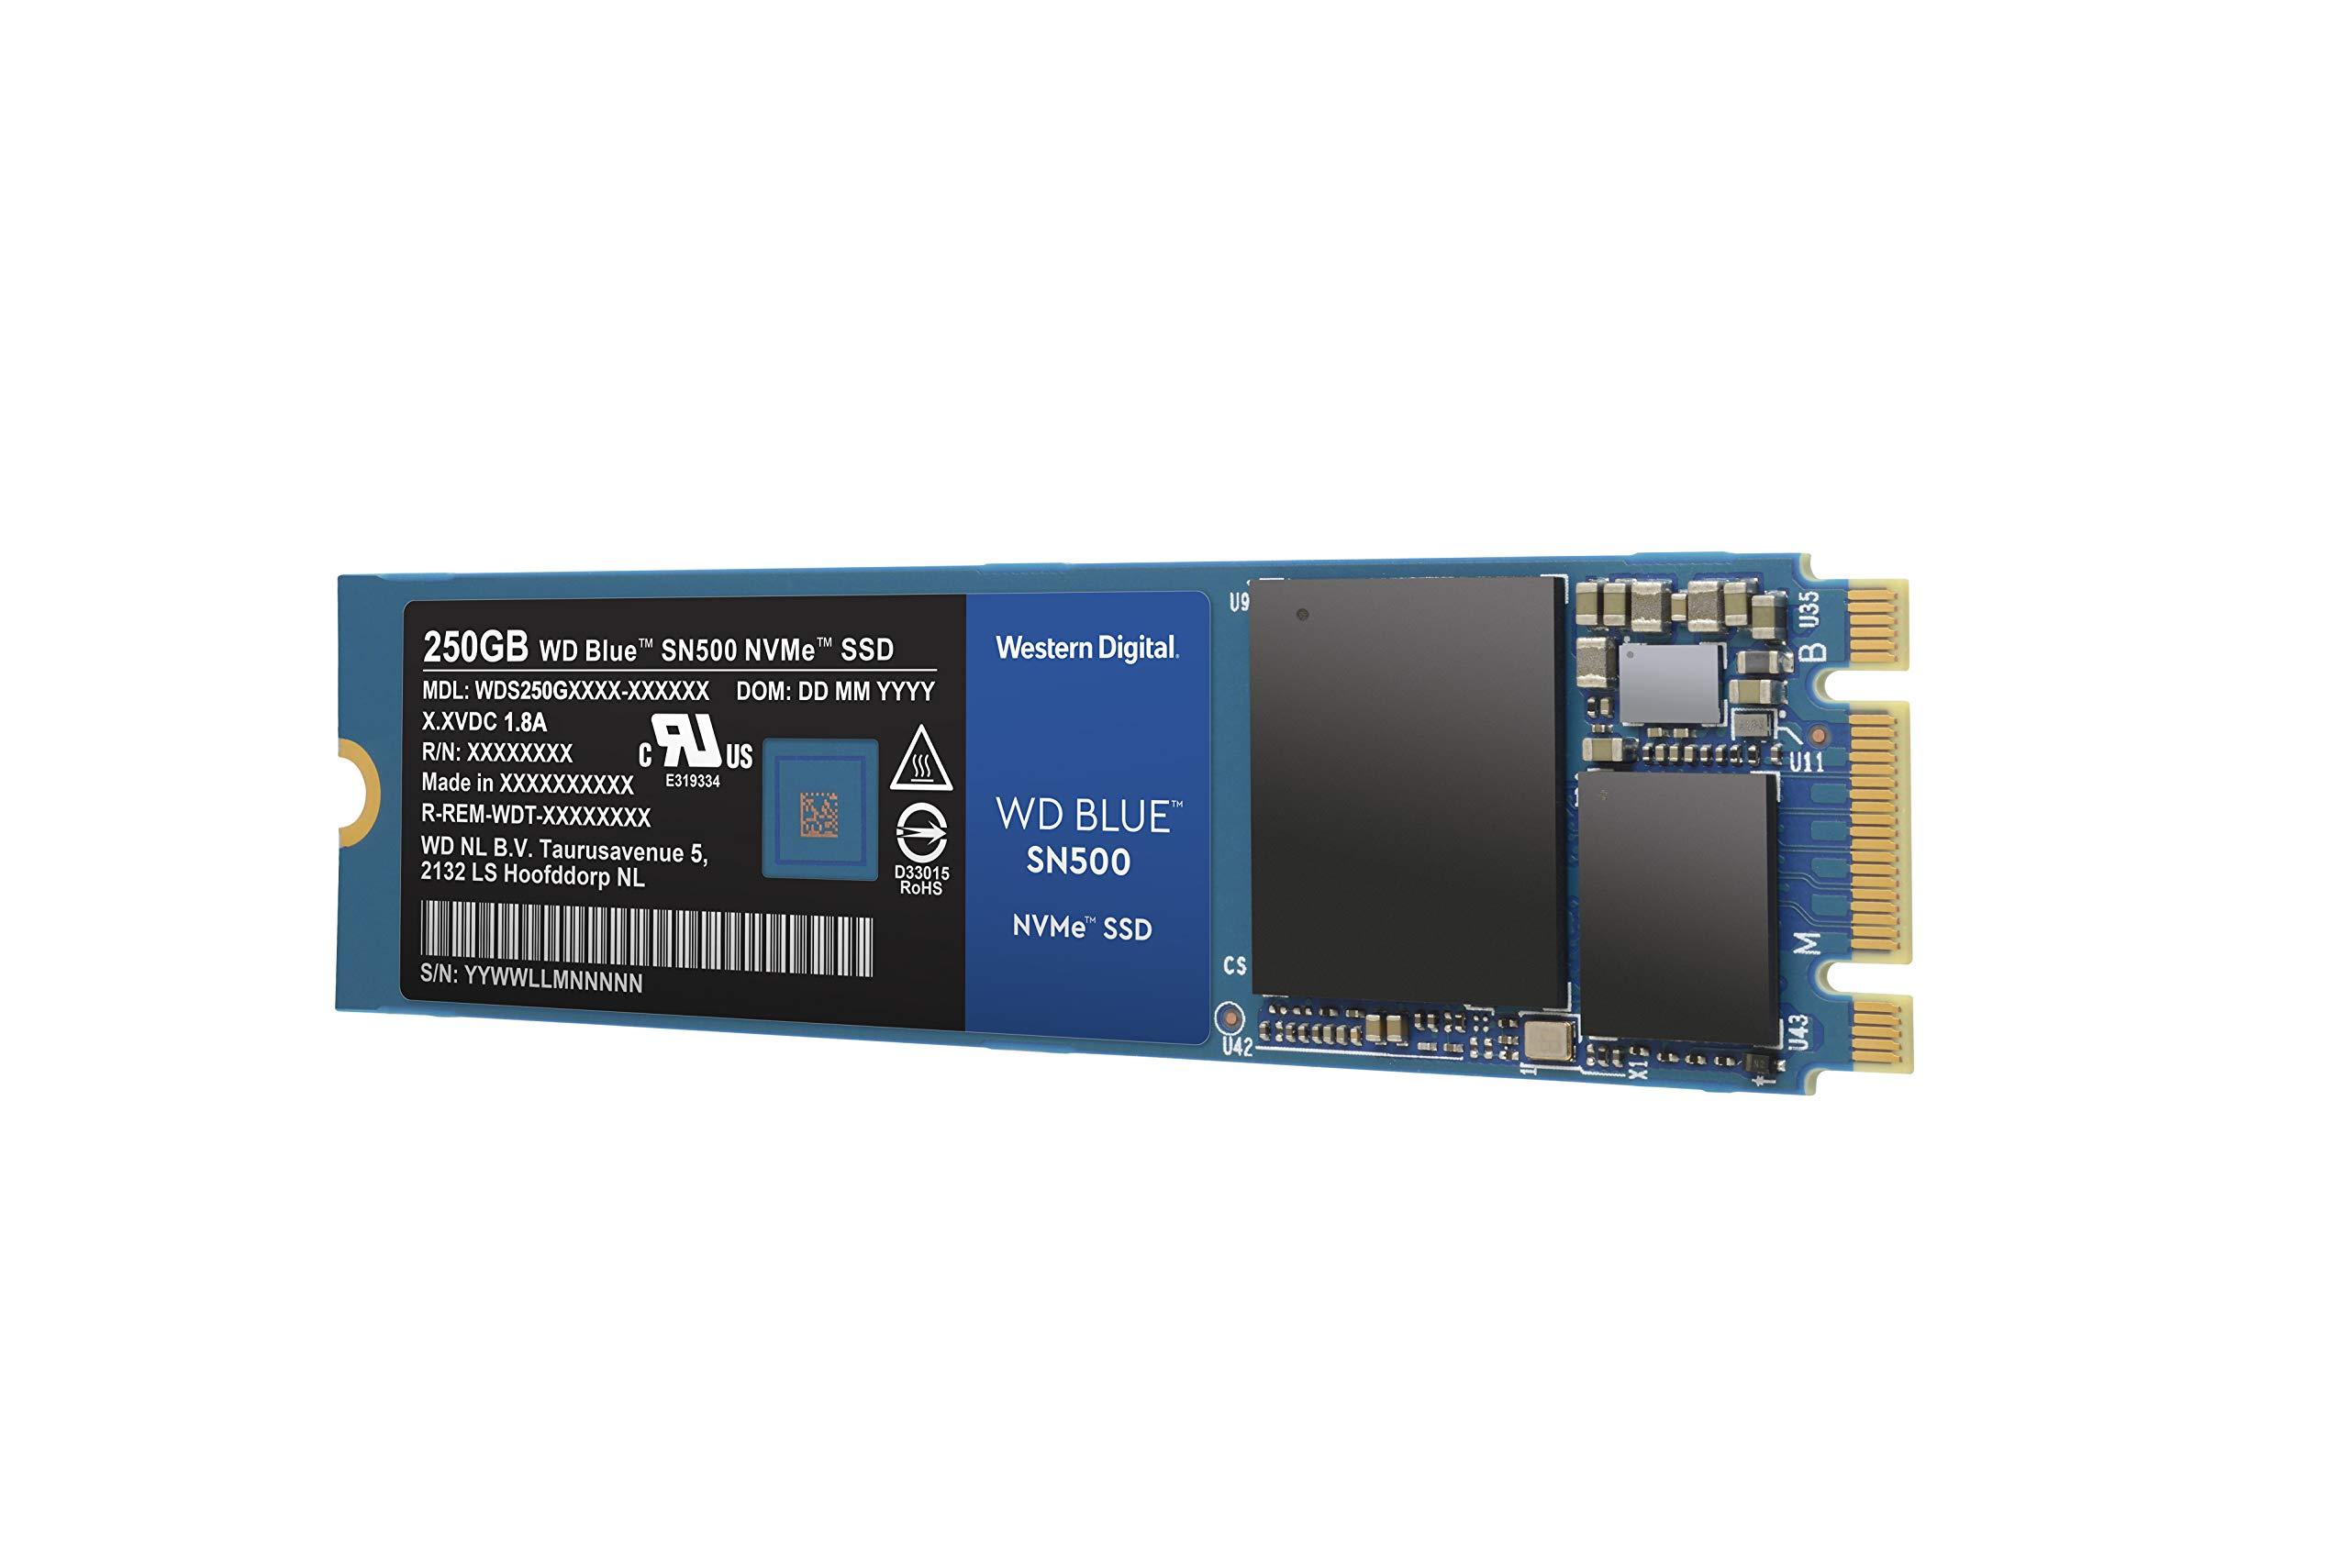 WD-Blue-SN500-High-Performance-NVMe-Internal-NVMe-SSD